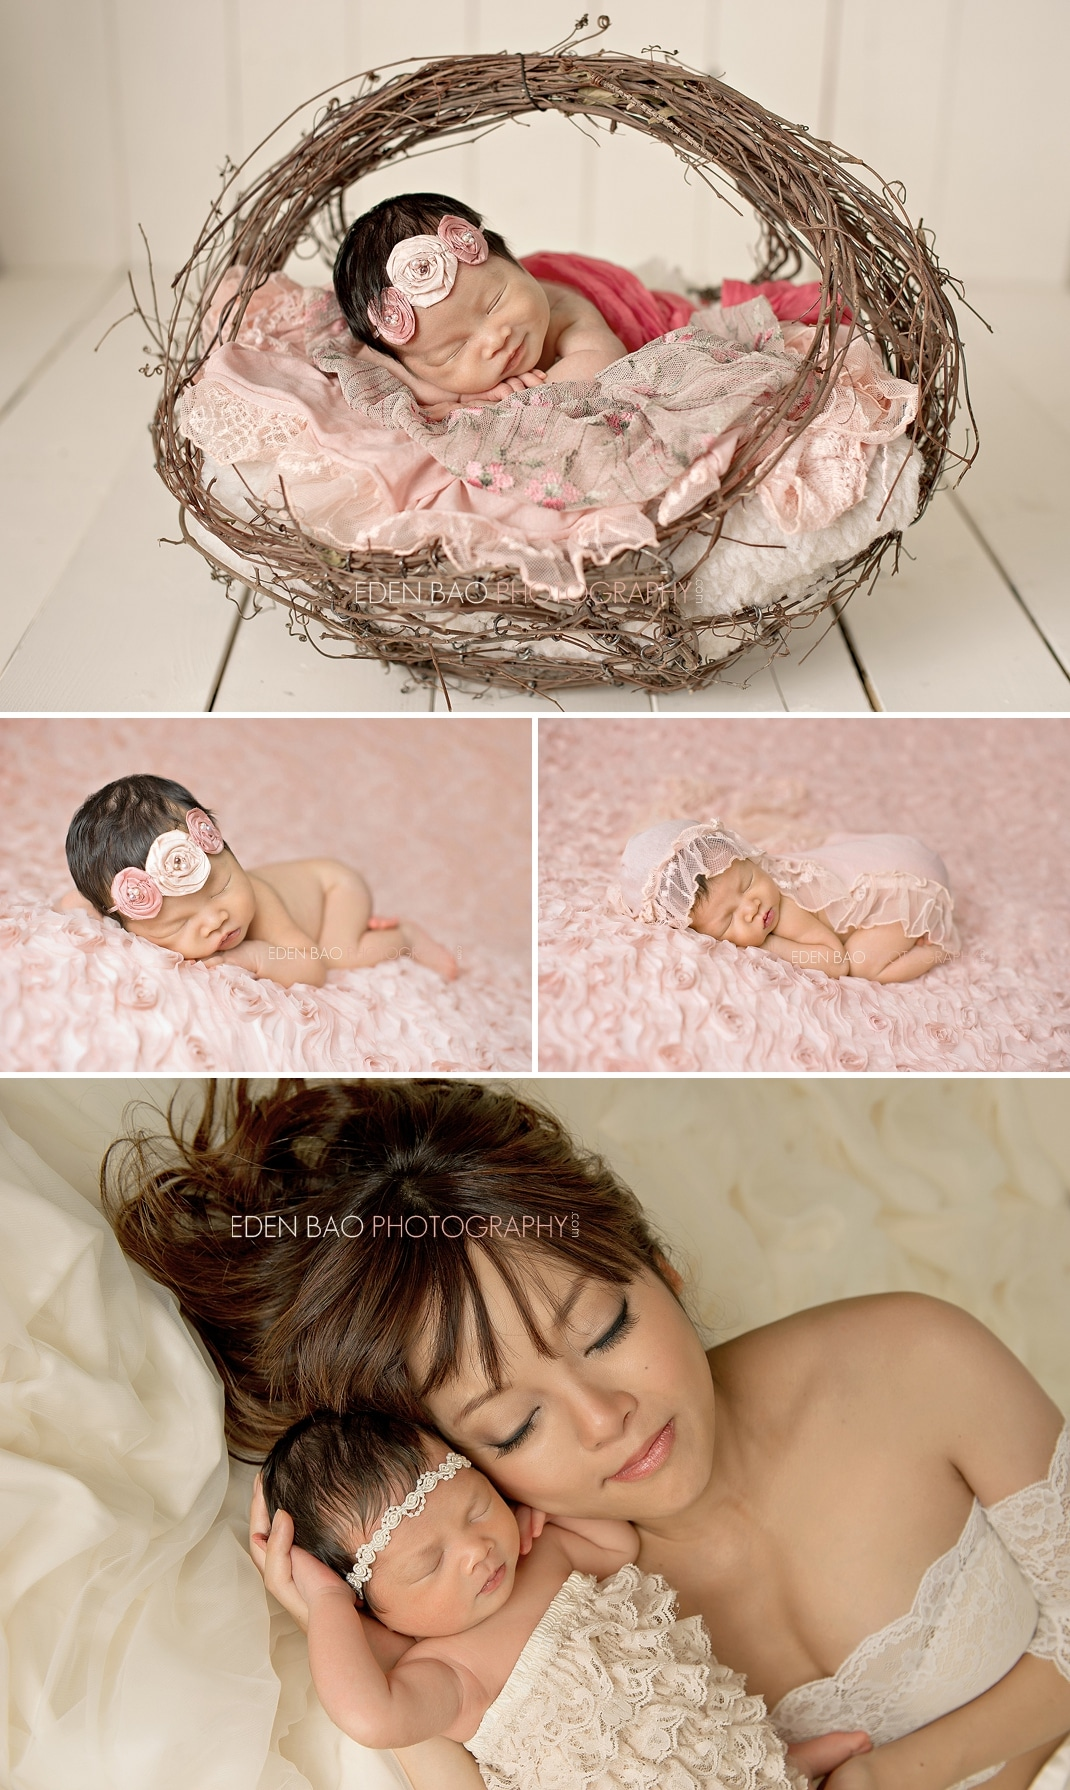 Port Moody Newborn Photographer Eden Bao | Newborn girl wicker basket pink blanket mom baby glamour